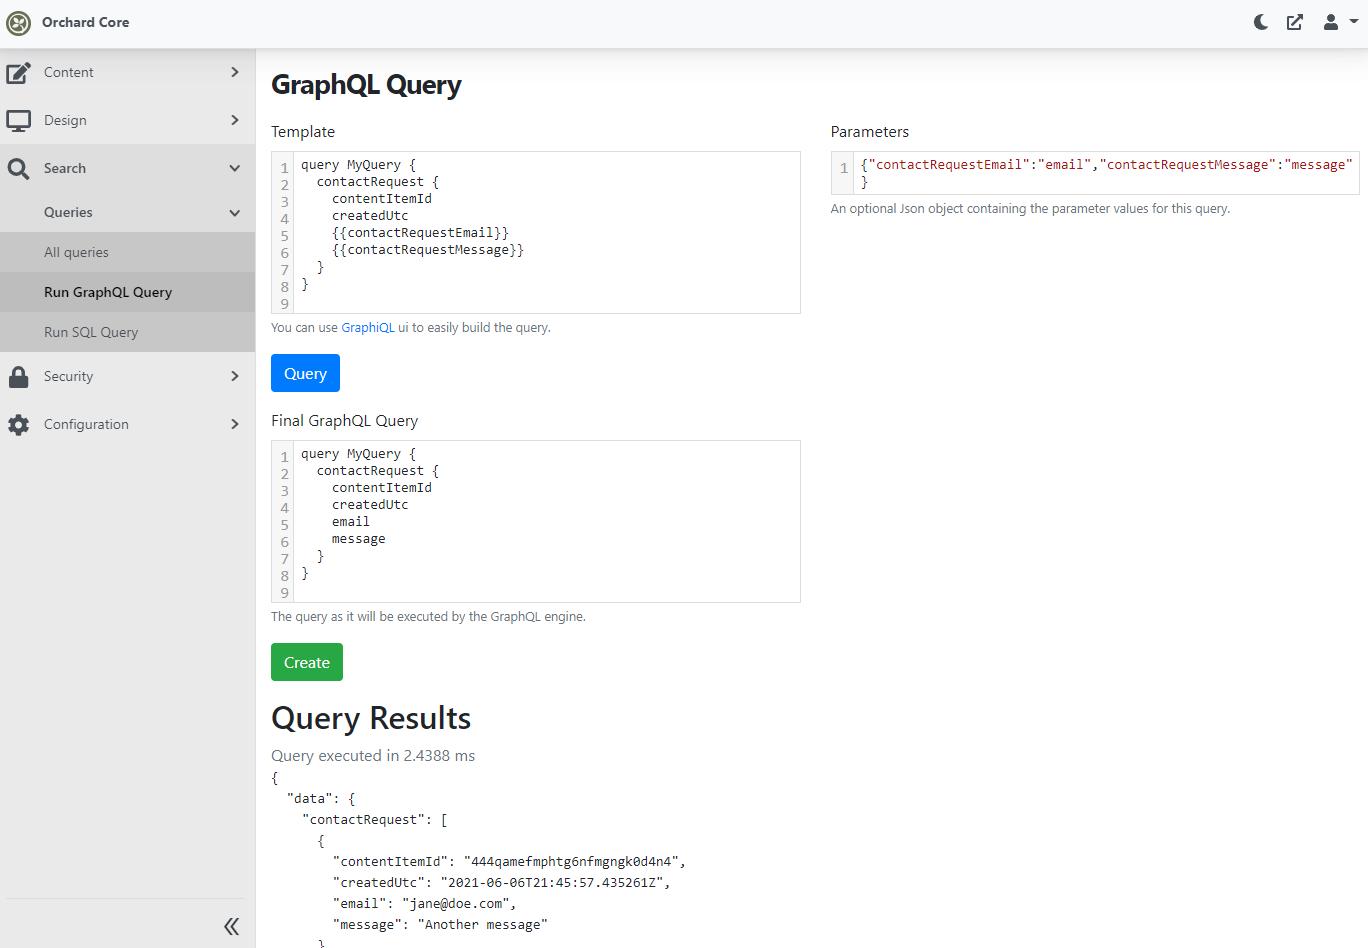 Templated GraphQL query